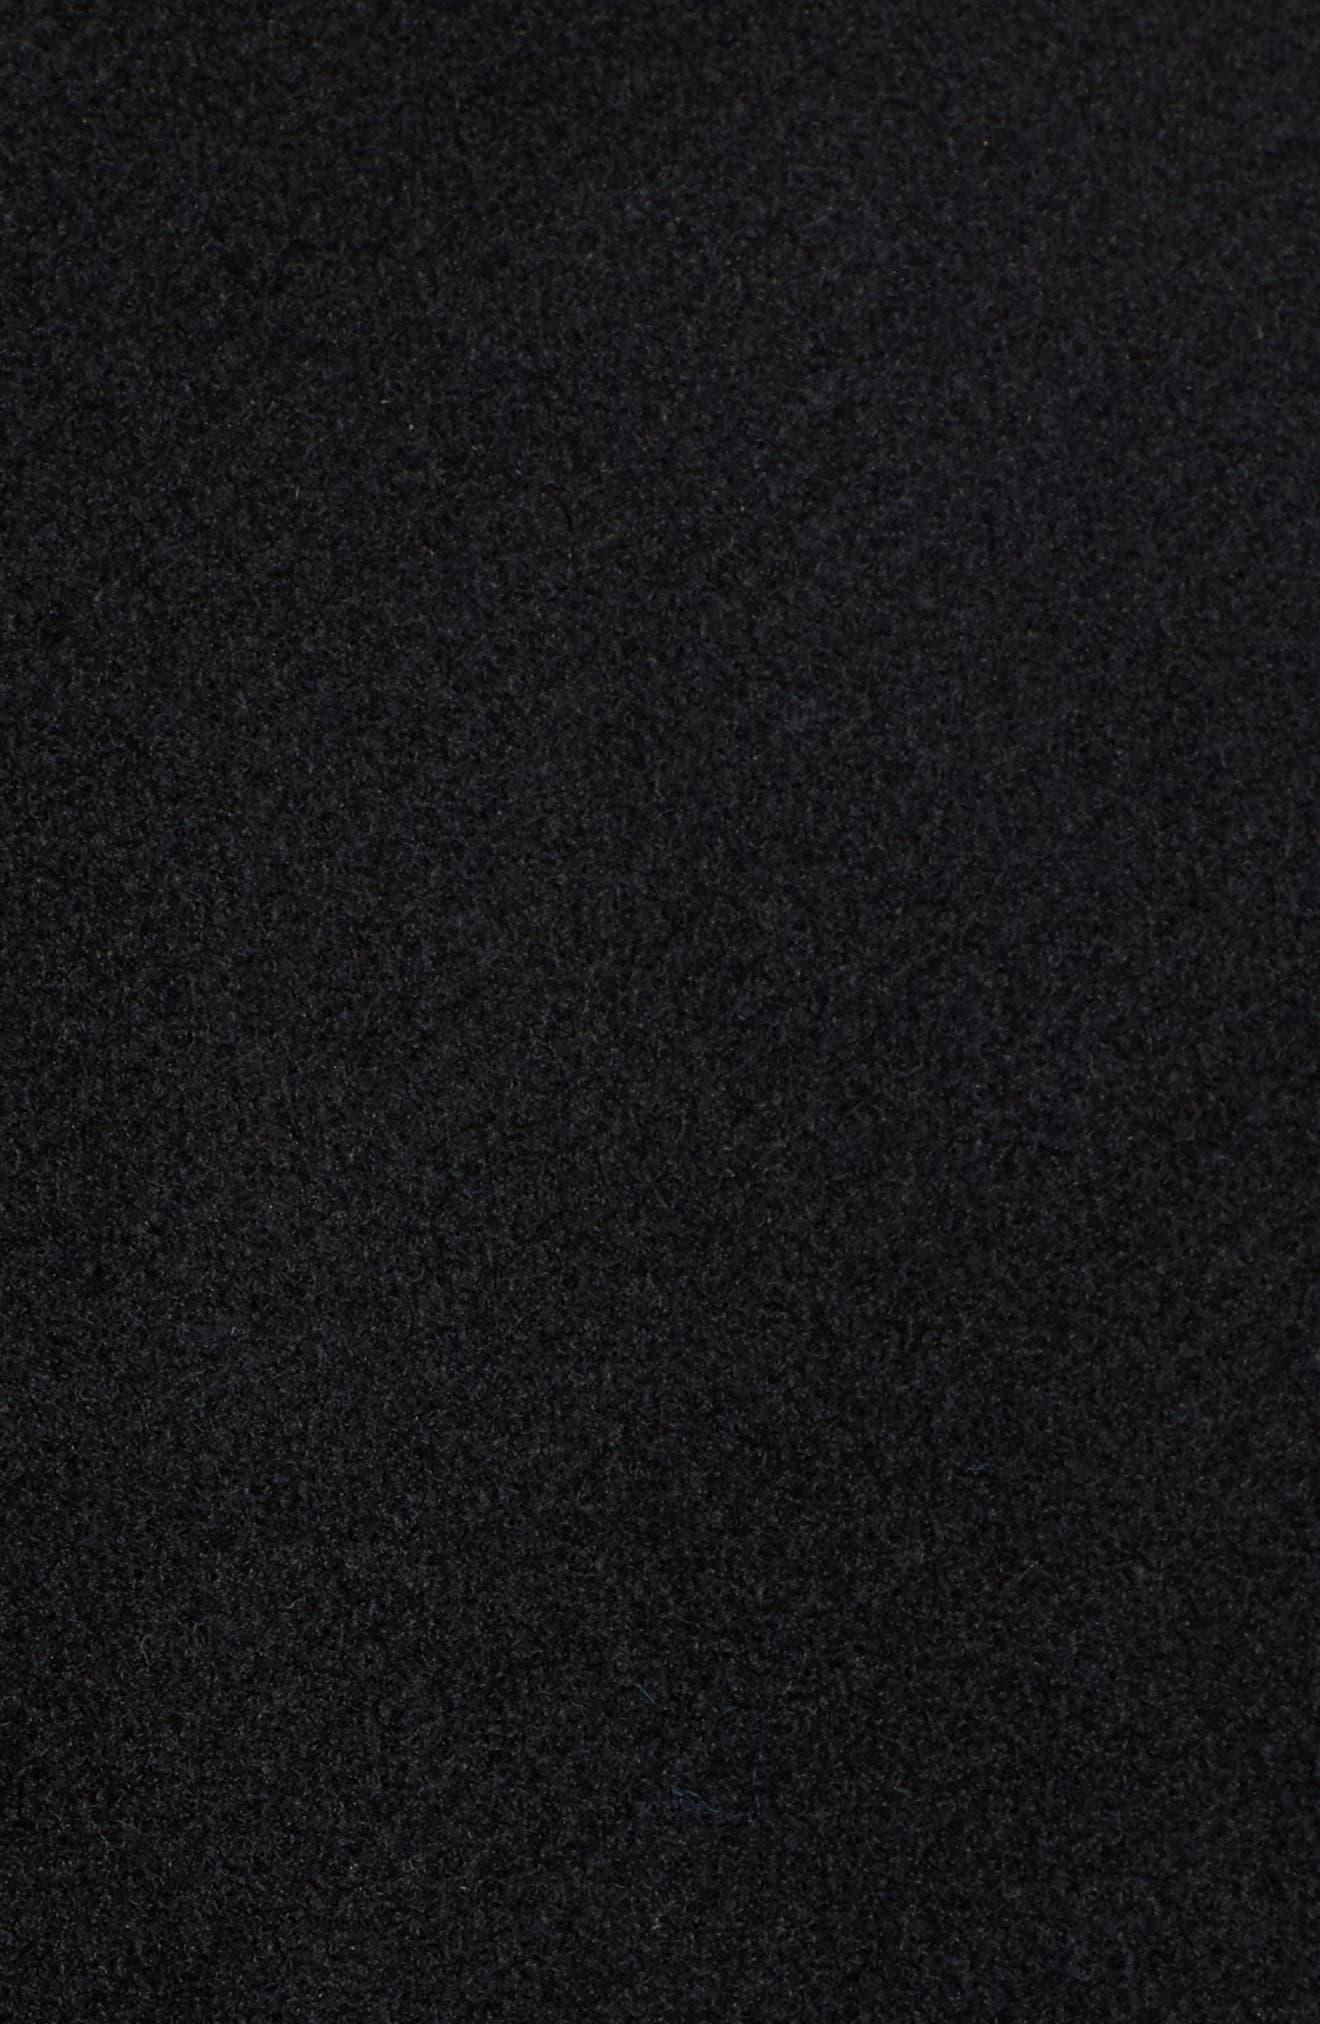 Eleanor Leather Trim Wool Blend Coat,                             Alternate thumbnail 5, color,                             Black/ Navy